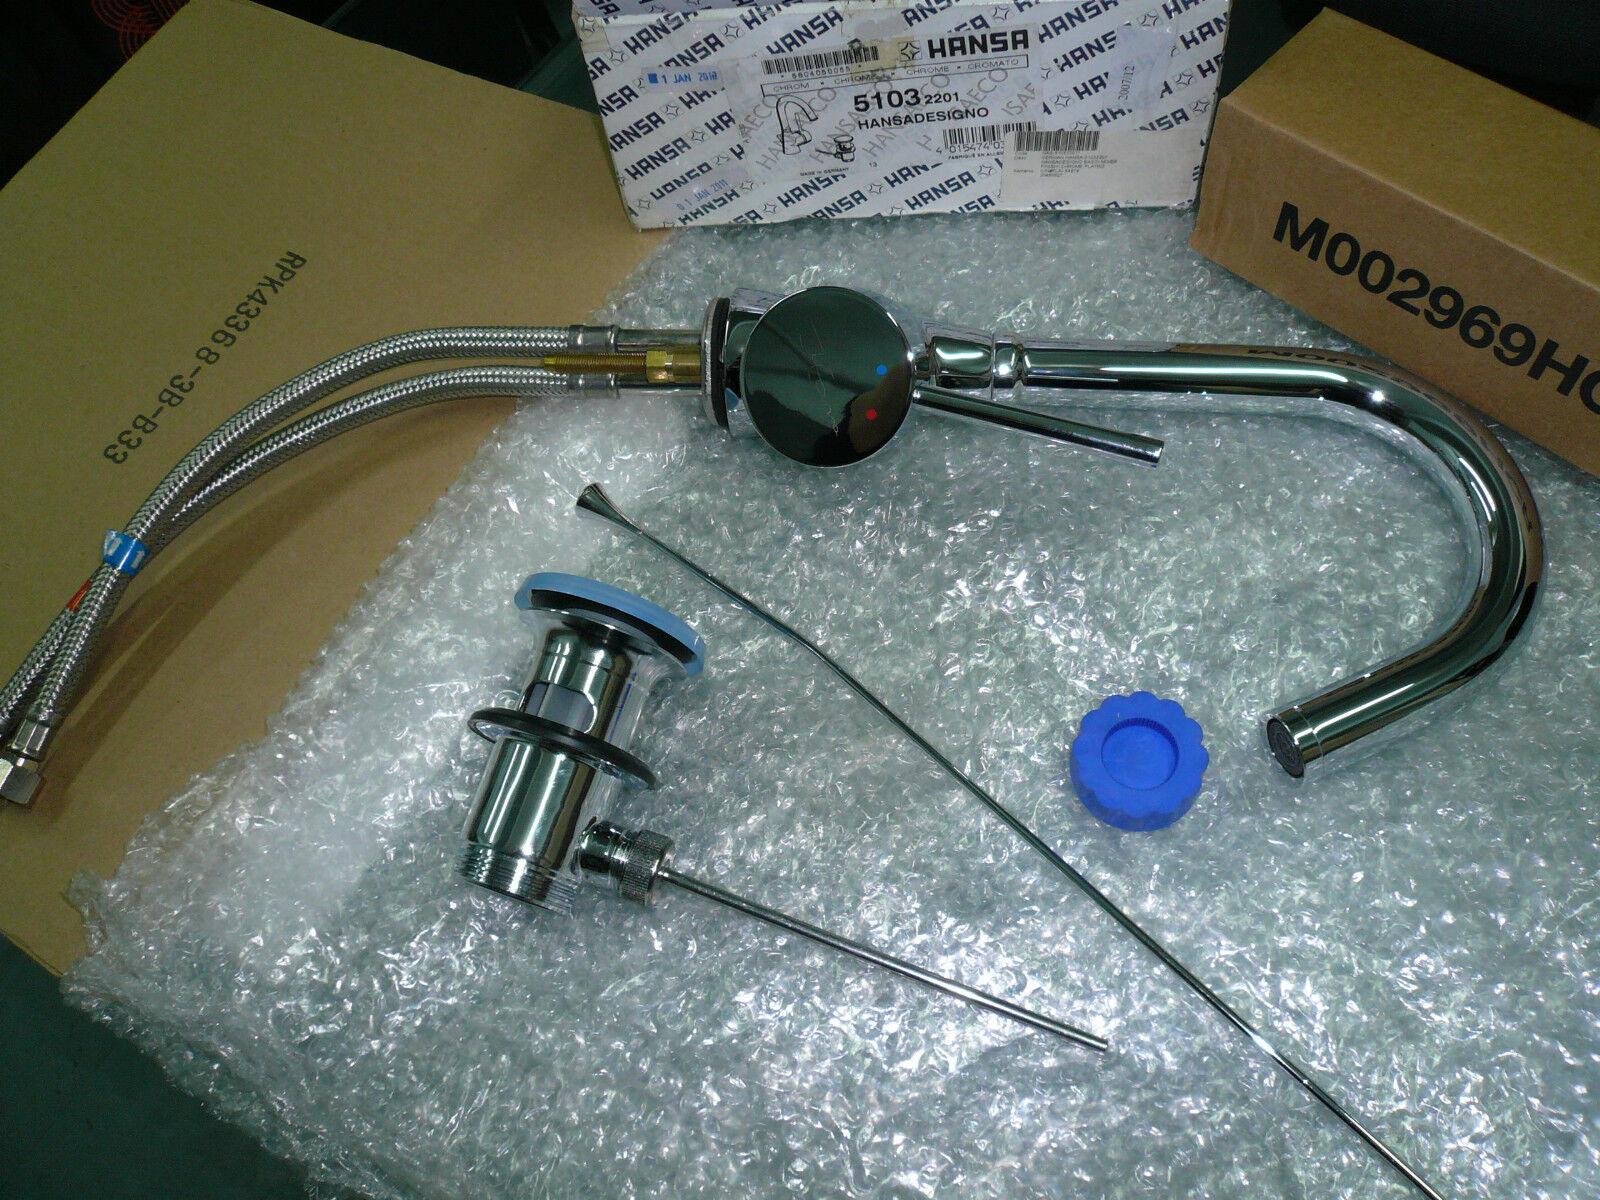 Hansa HANSADESIGNO 51032201 Single Lever Swivel Spout Basin Mixer W ...